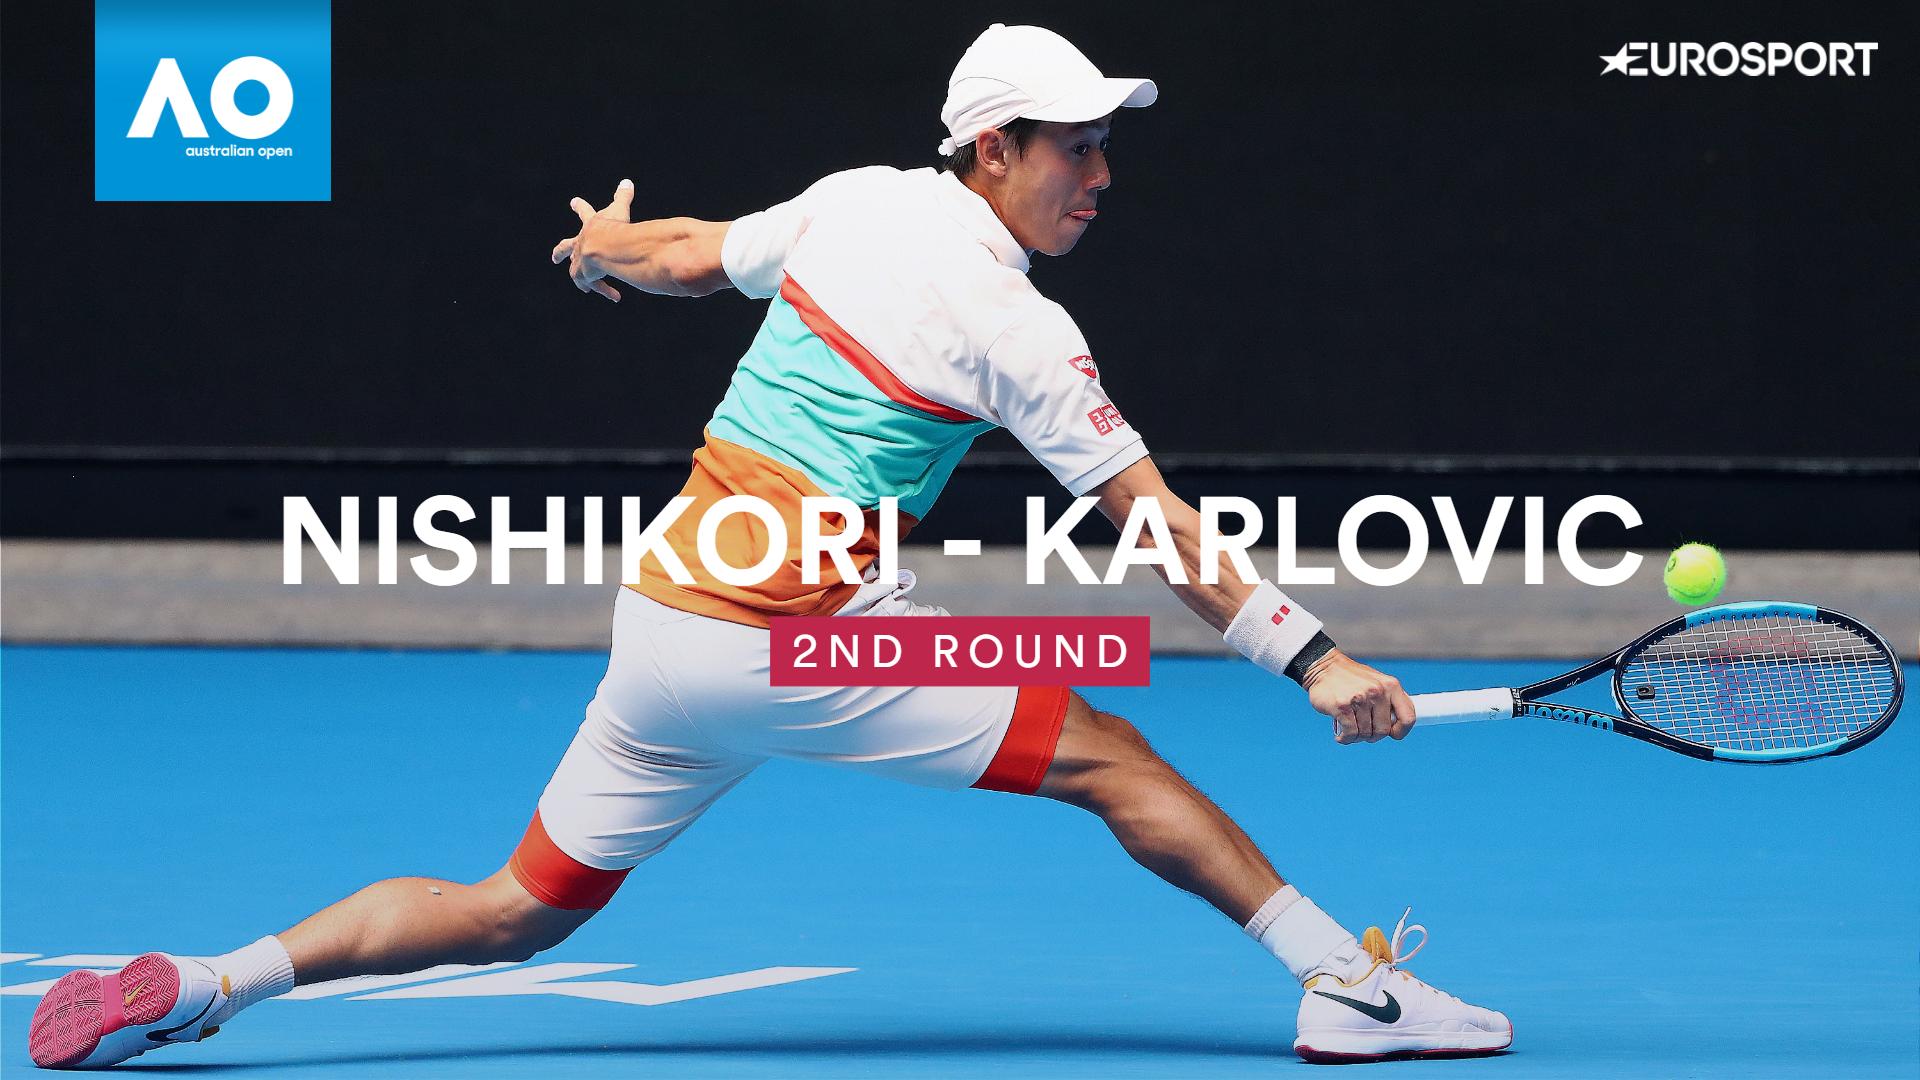 Australian Open - Match of the Day : Nishikori vs  Karlovic